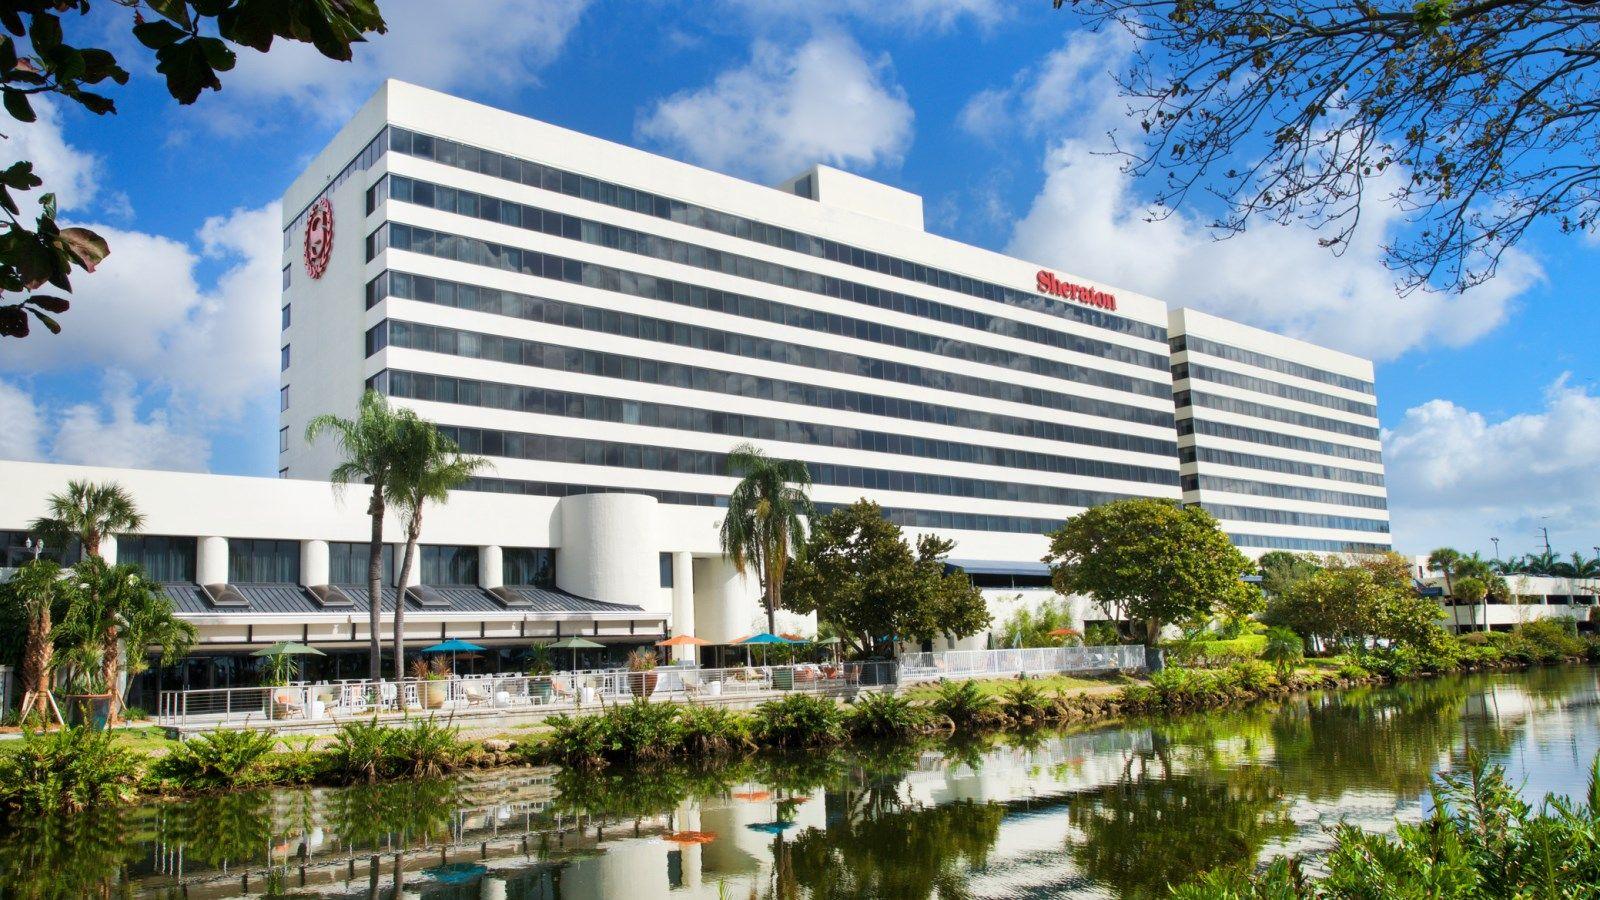 Hotels Motels Near Miami International Airport